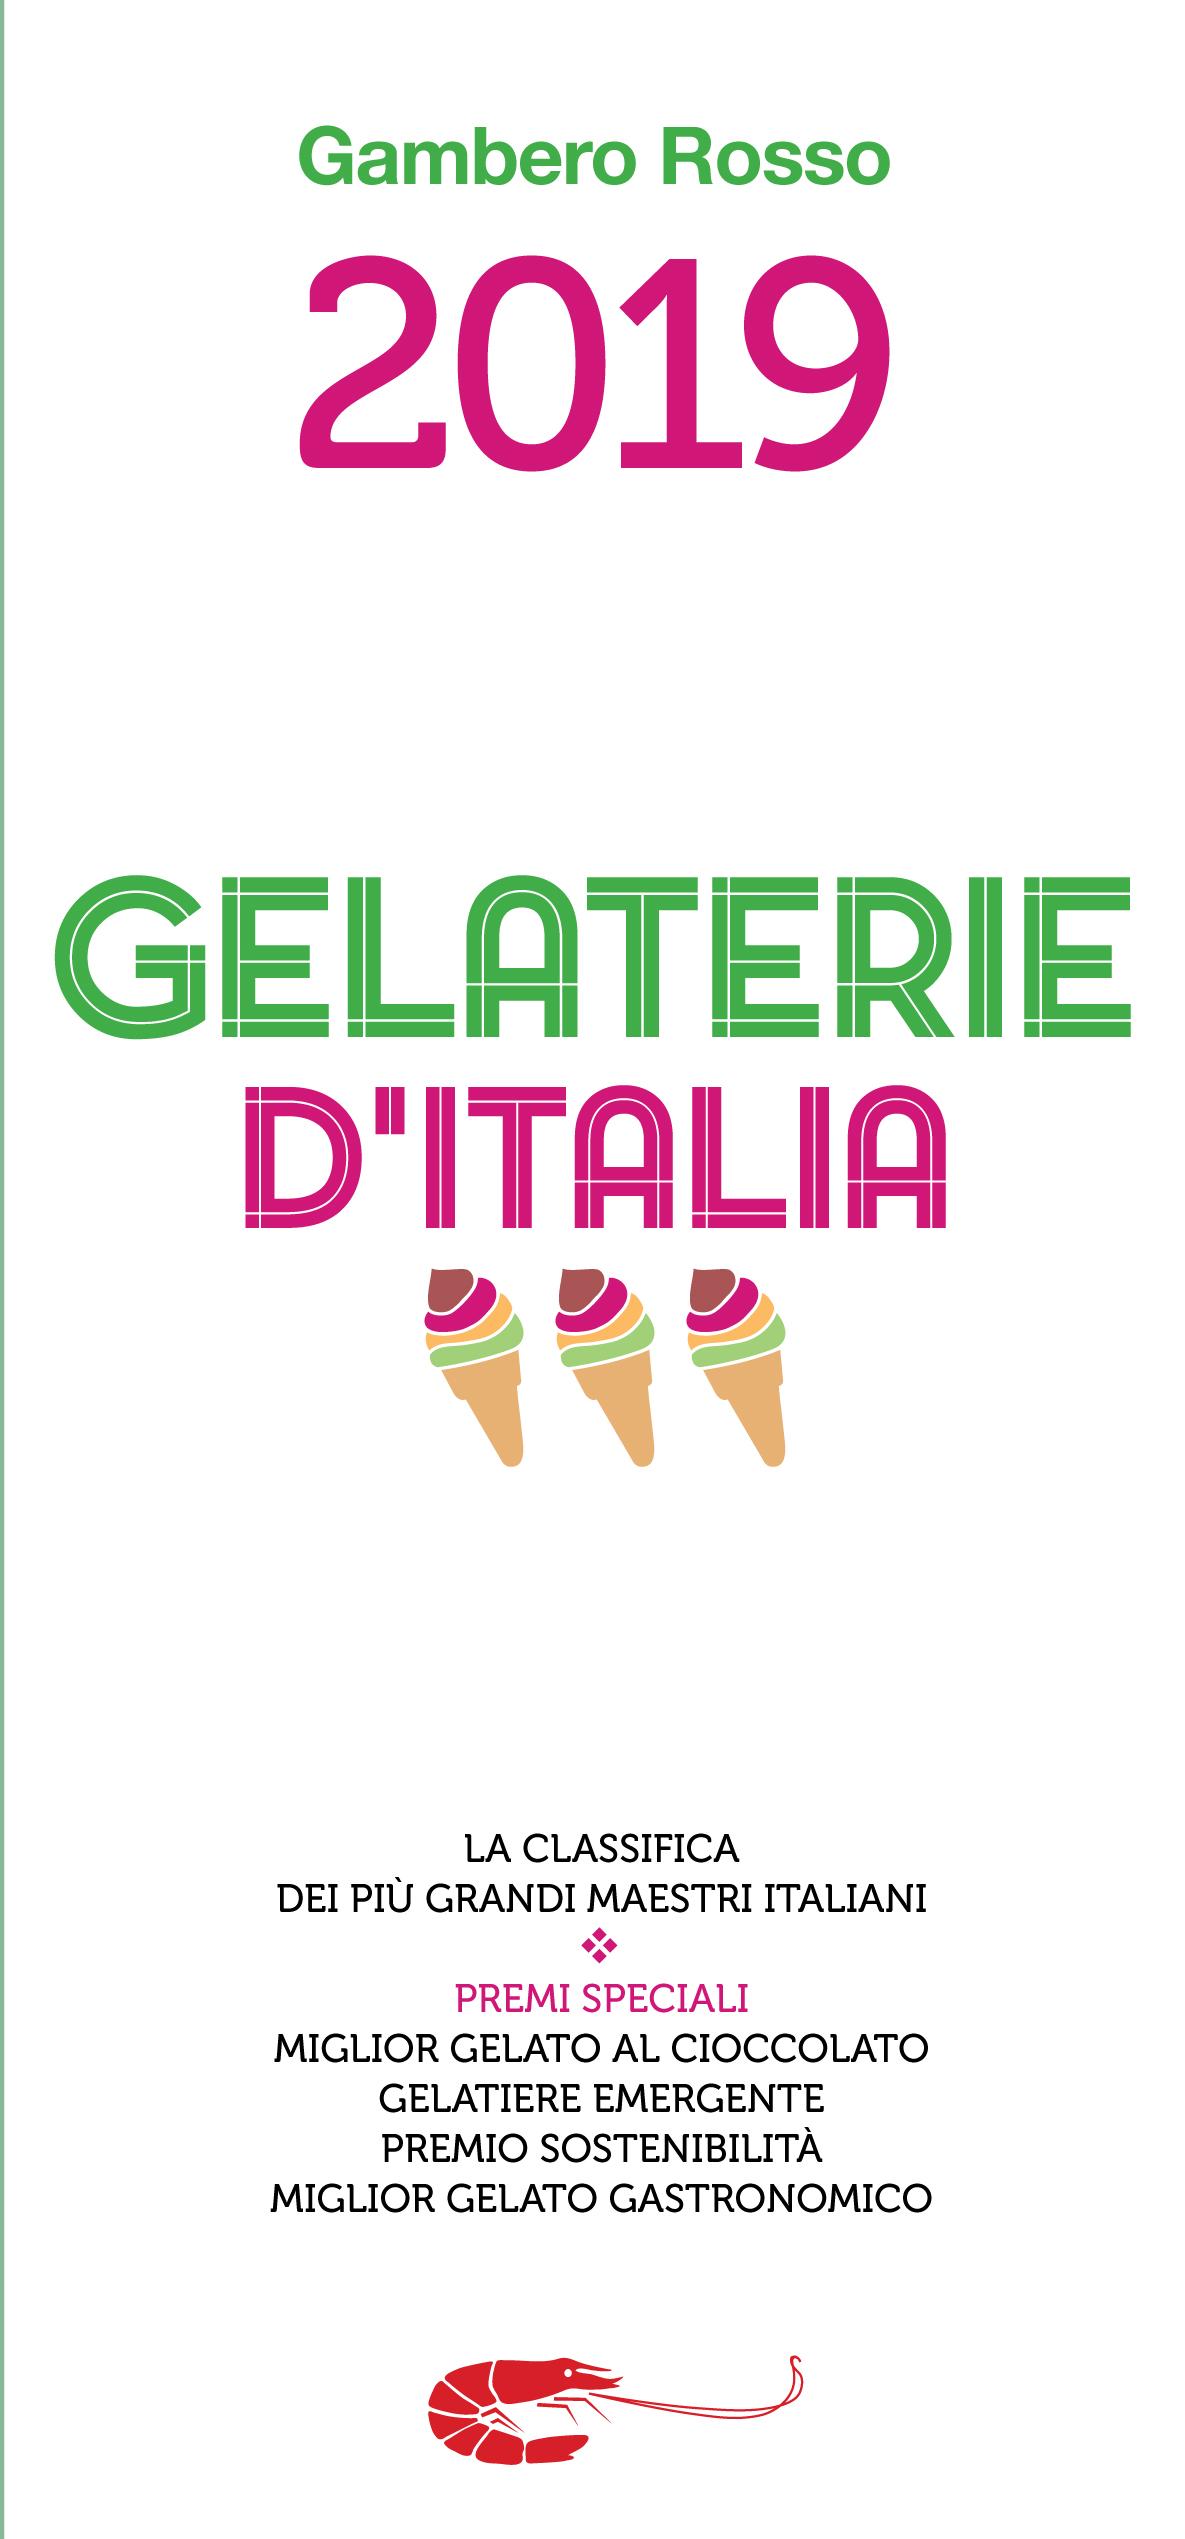 Risultati immagini per gelaterie d'italia 2019